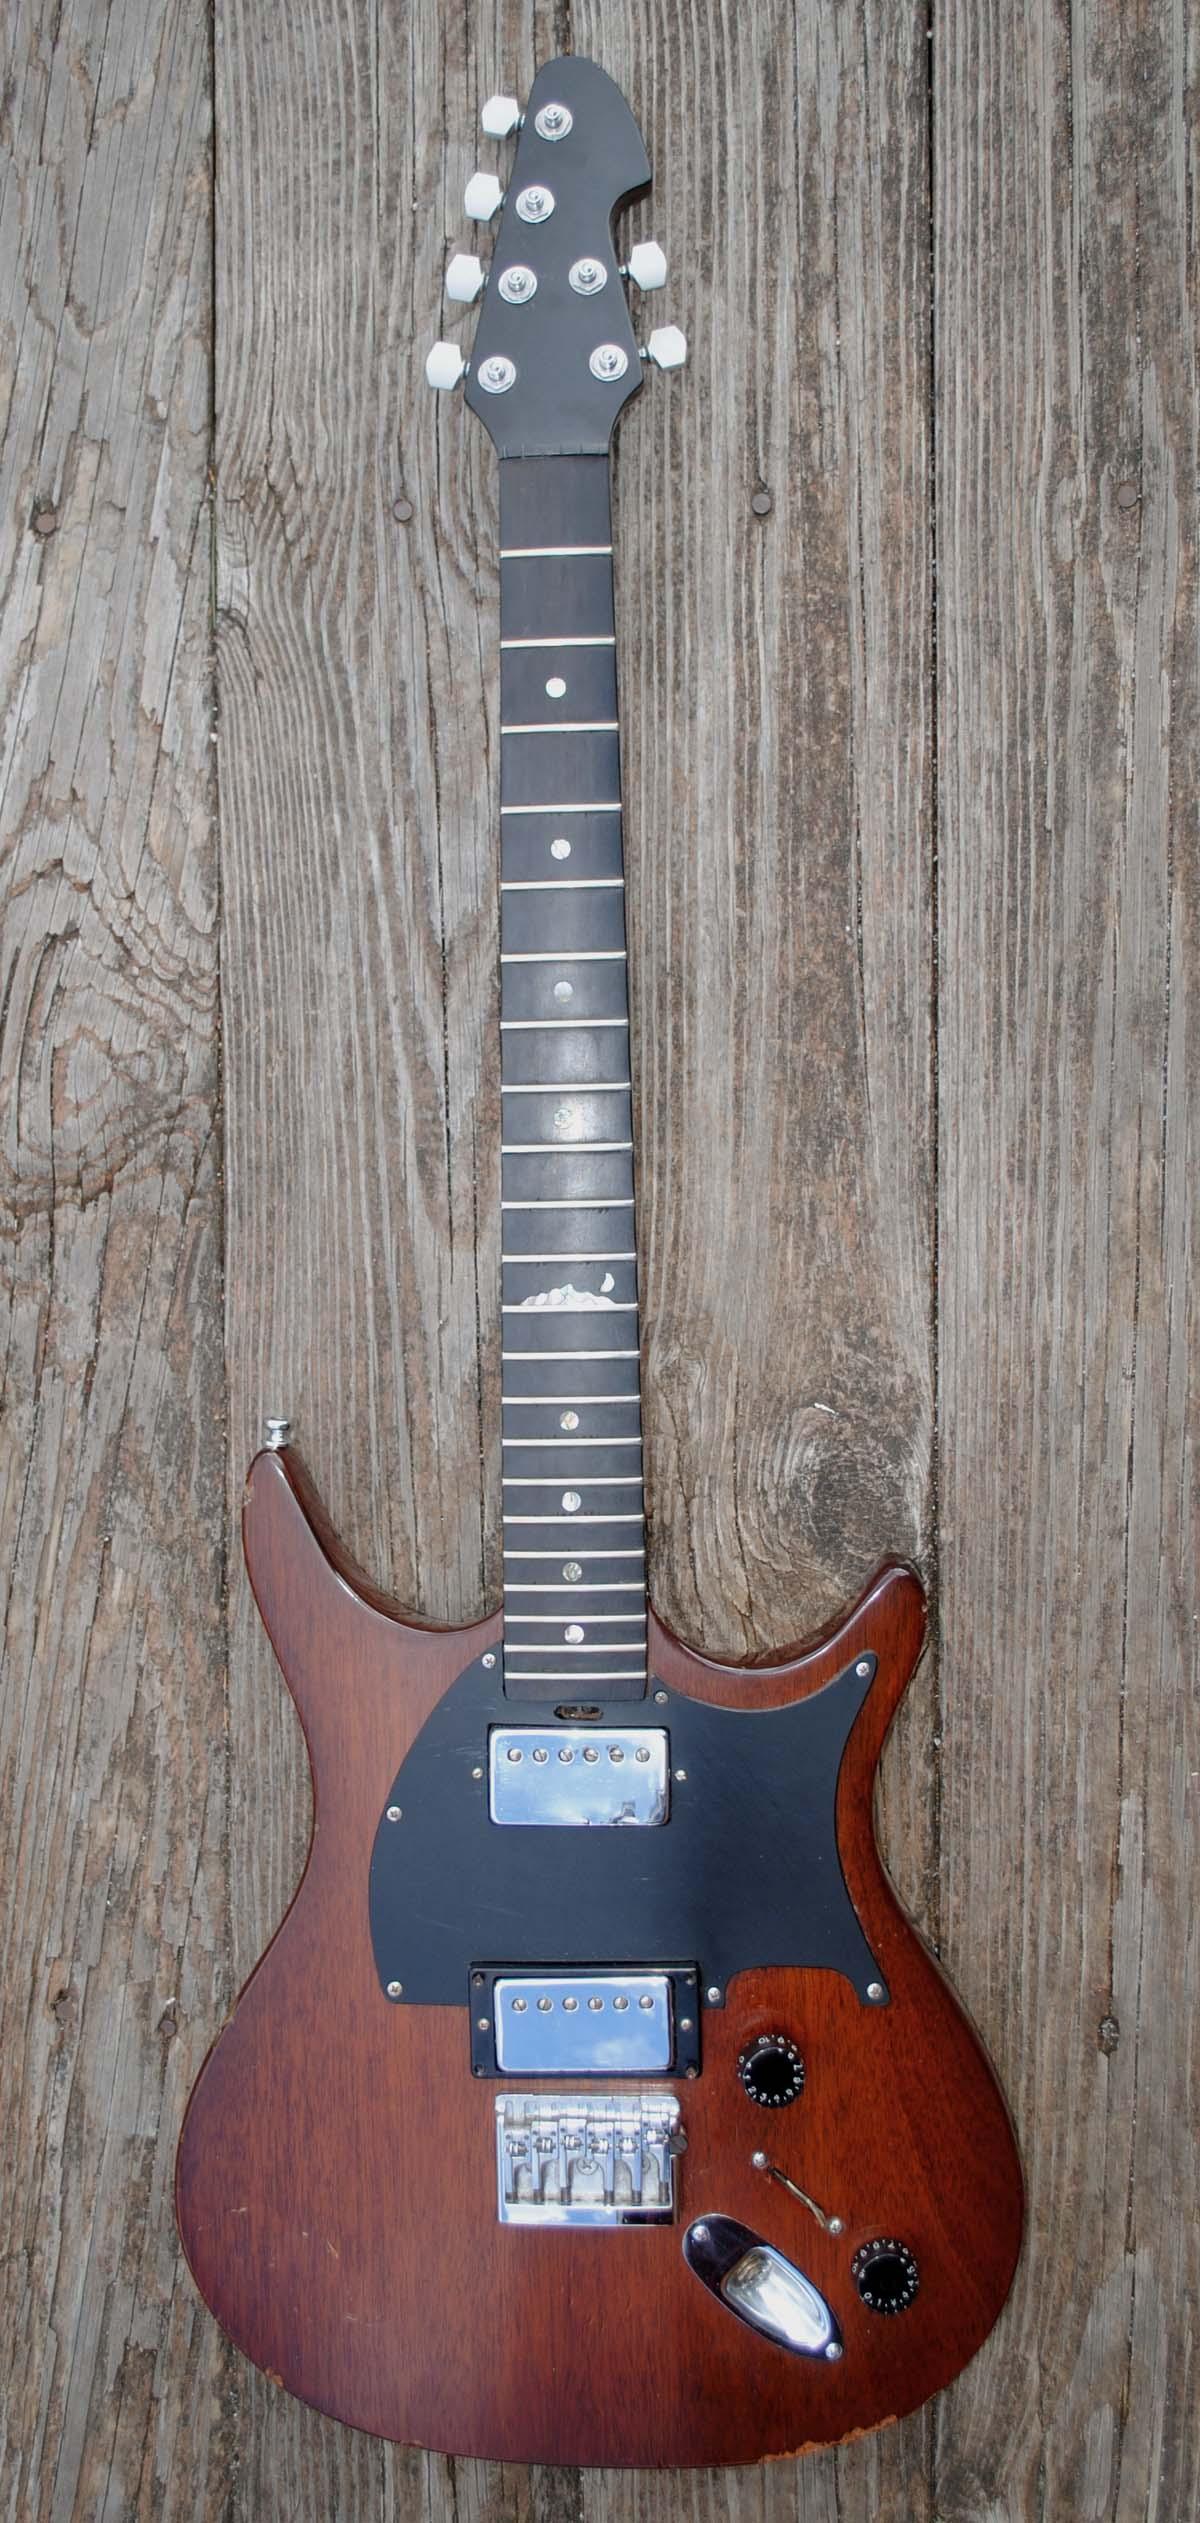 rare brooks brian moore prototype custom electric guitar for sale classifieds. Black Bedroom Furniture Sets. Home Design Ideas